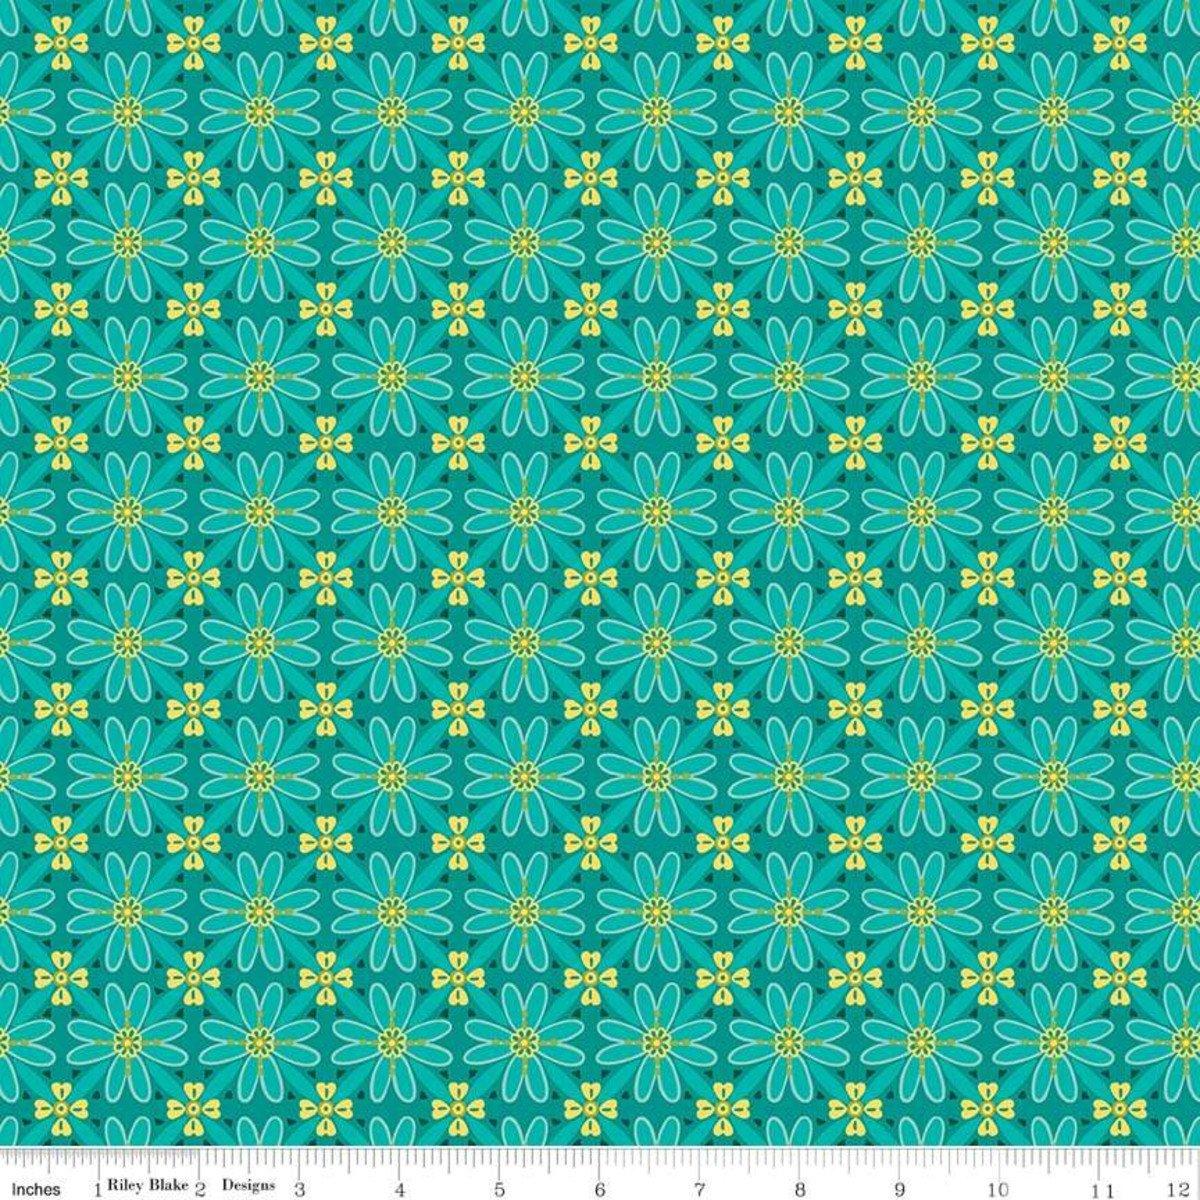 Mosaic Teal - Wildflower Bouquet